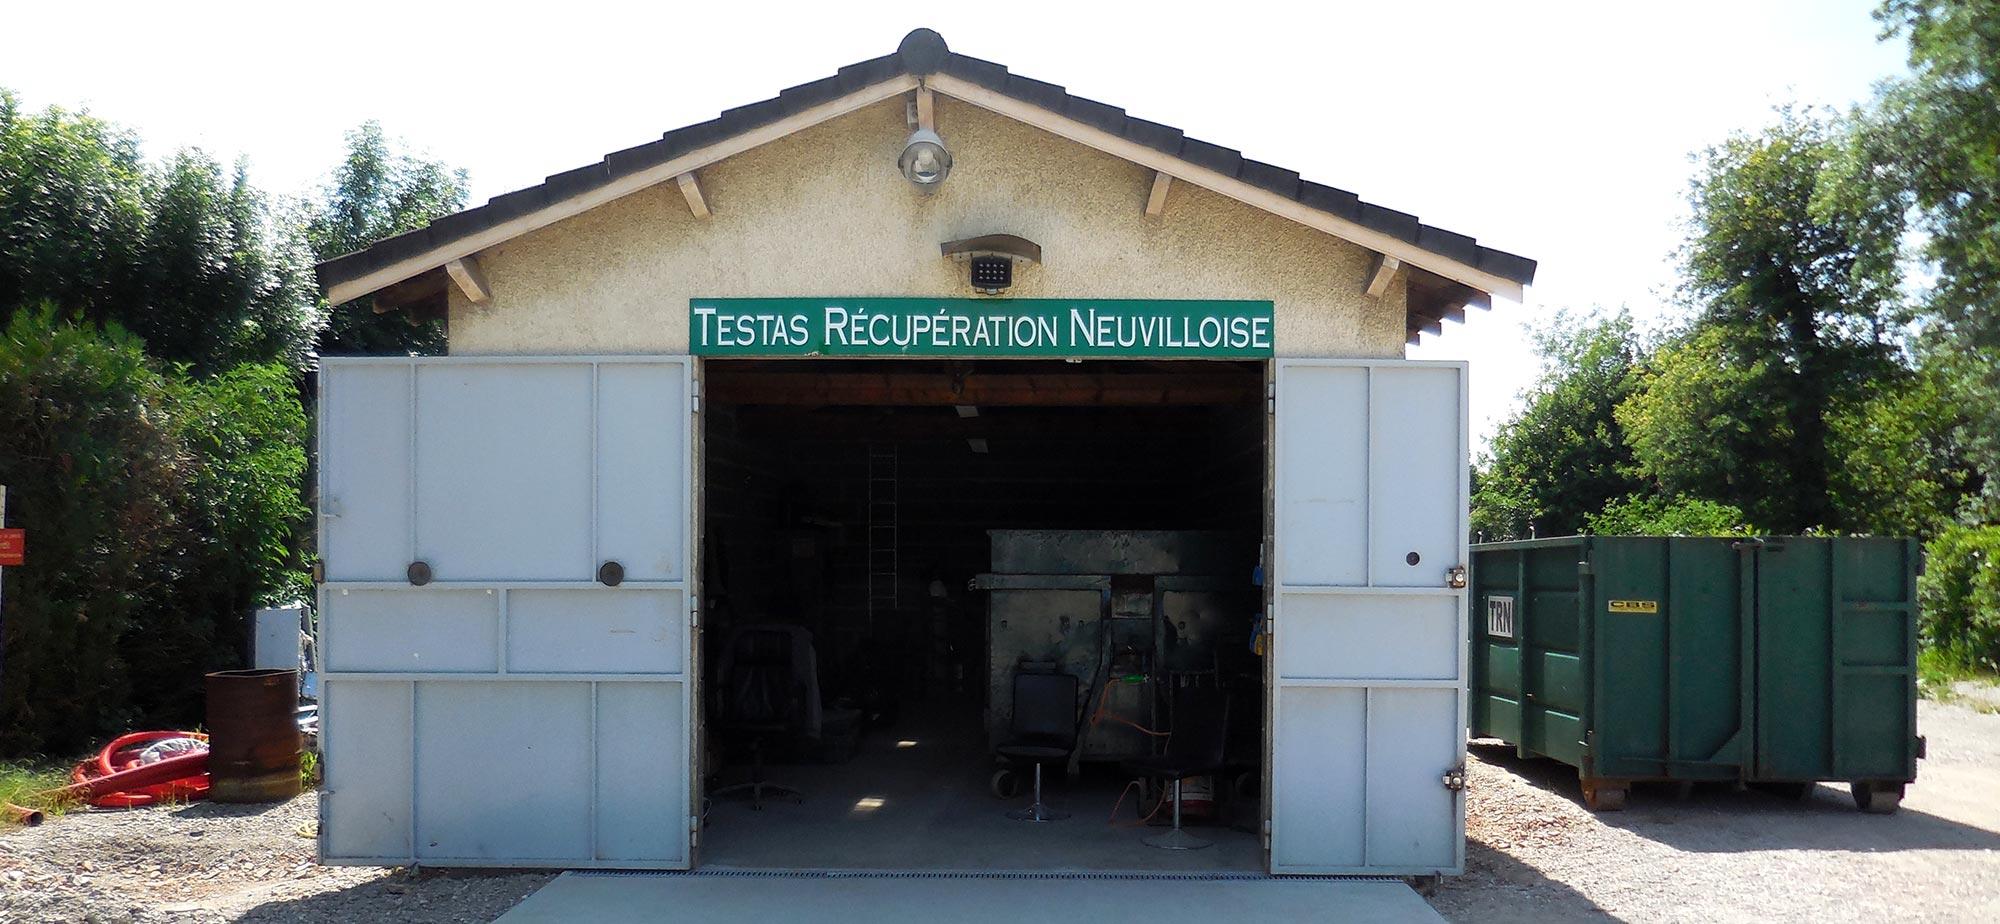 Testas récupération Neuvilloise